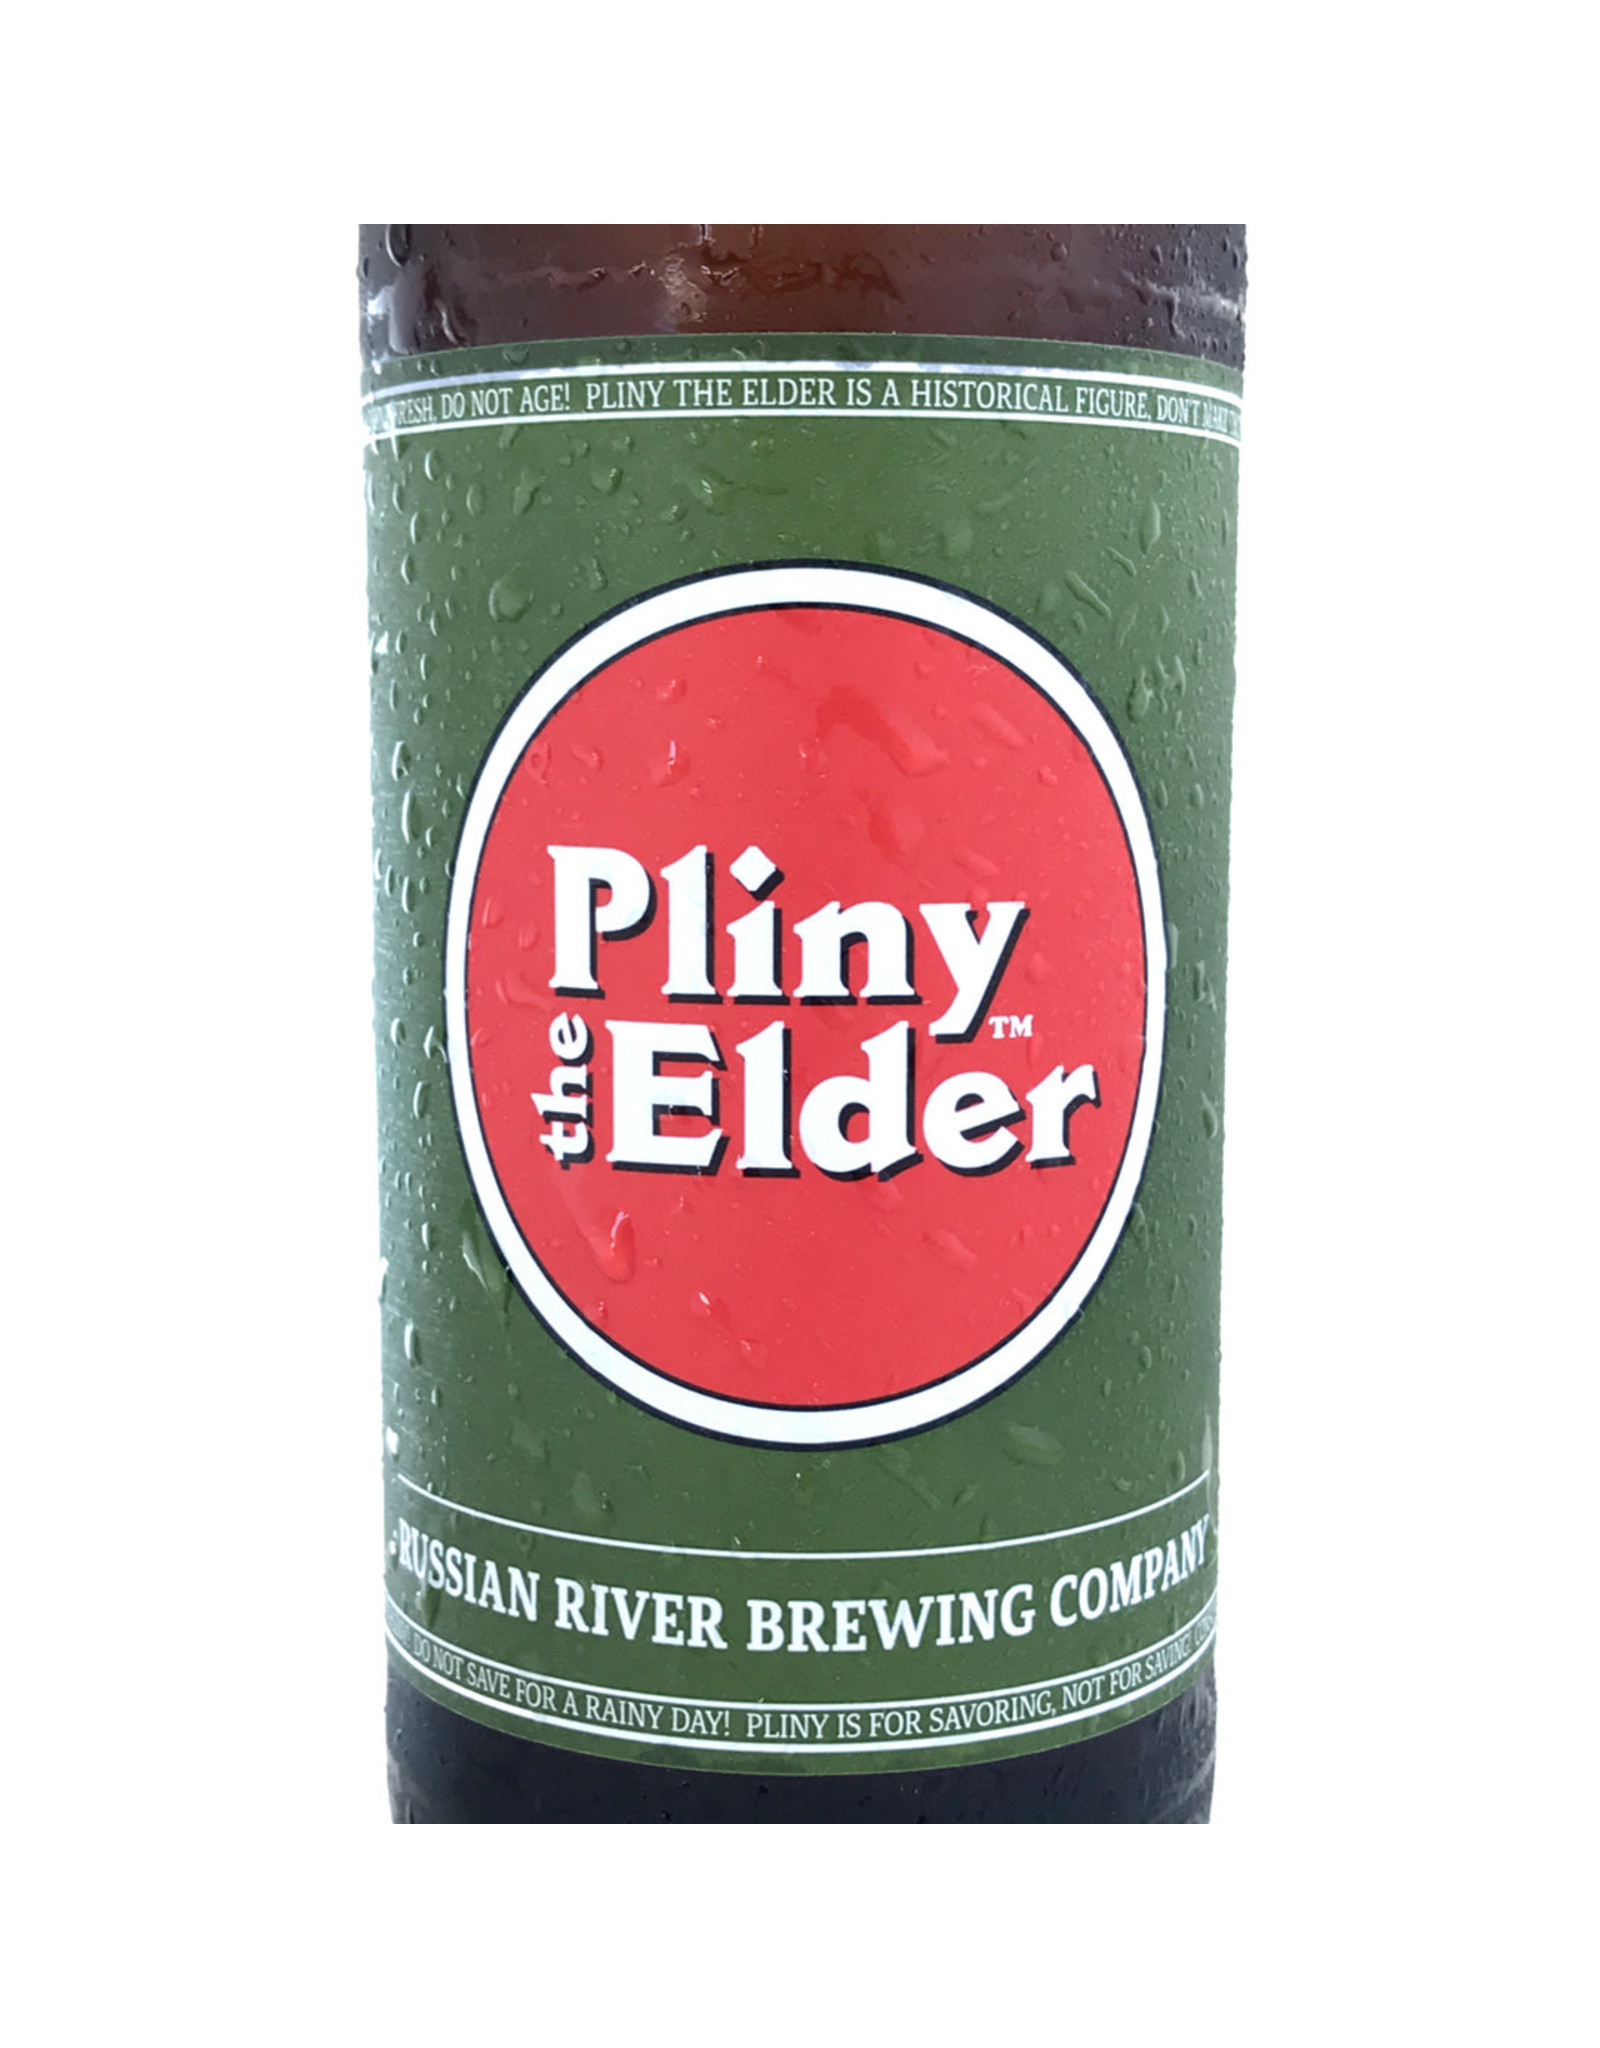 Russian River Brewing Company Russian River Beer Pliny The Elder DIPA